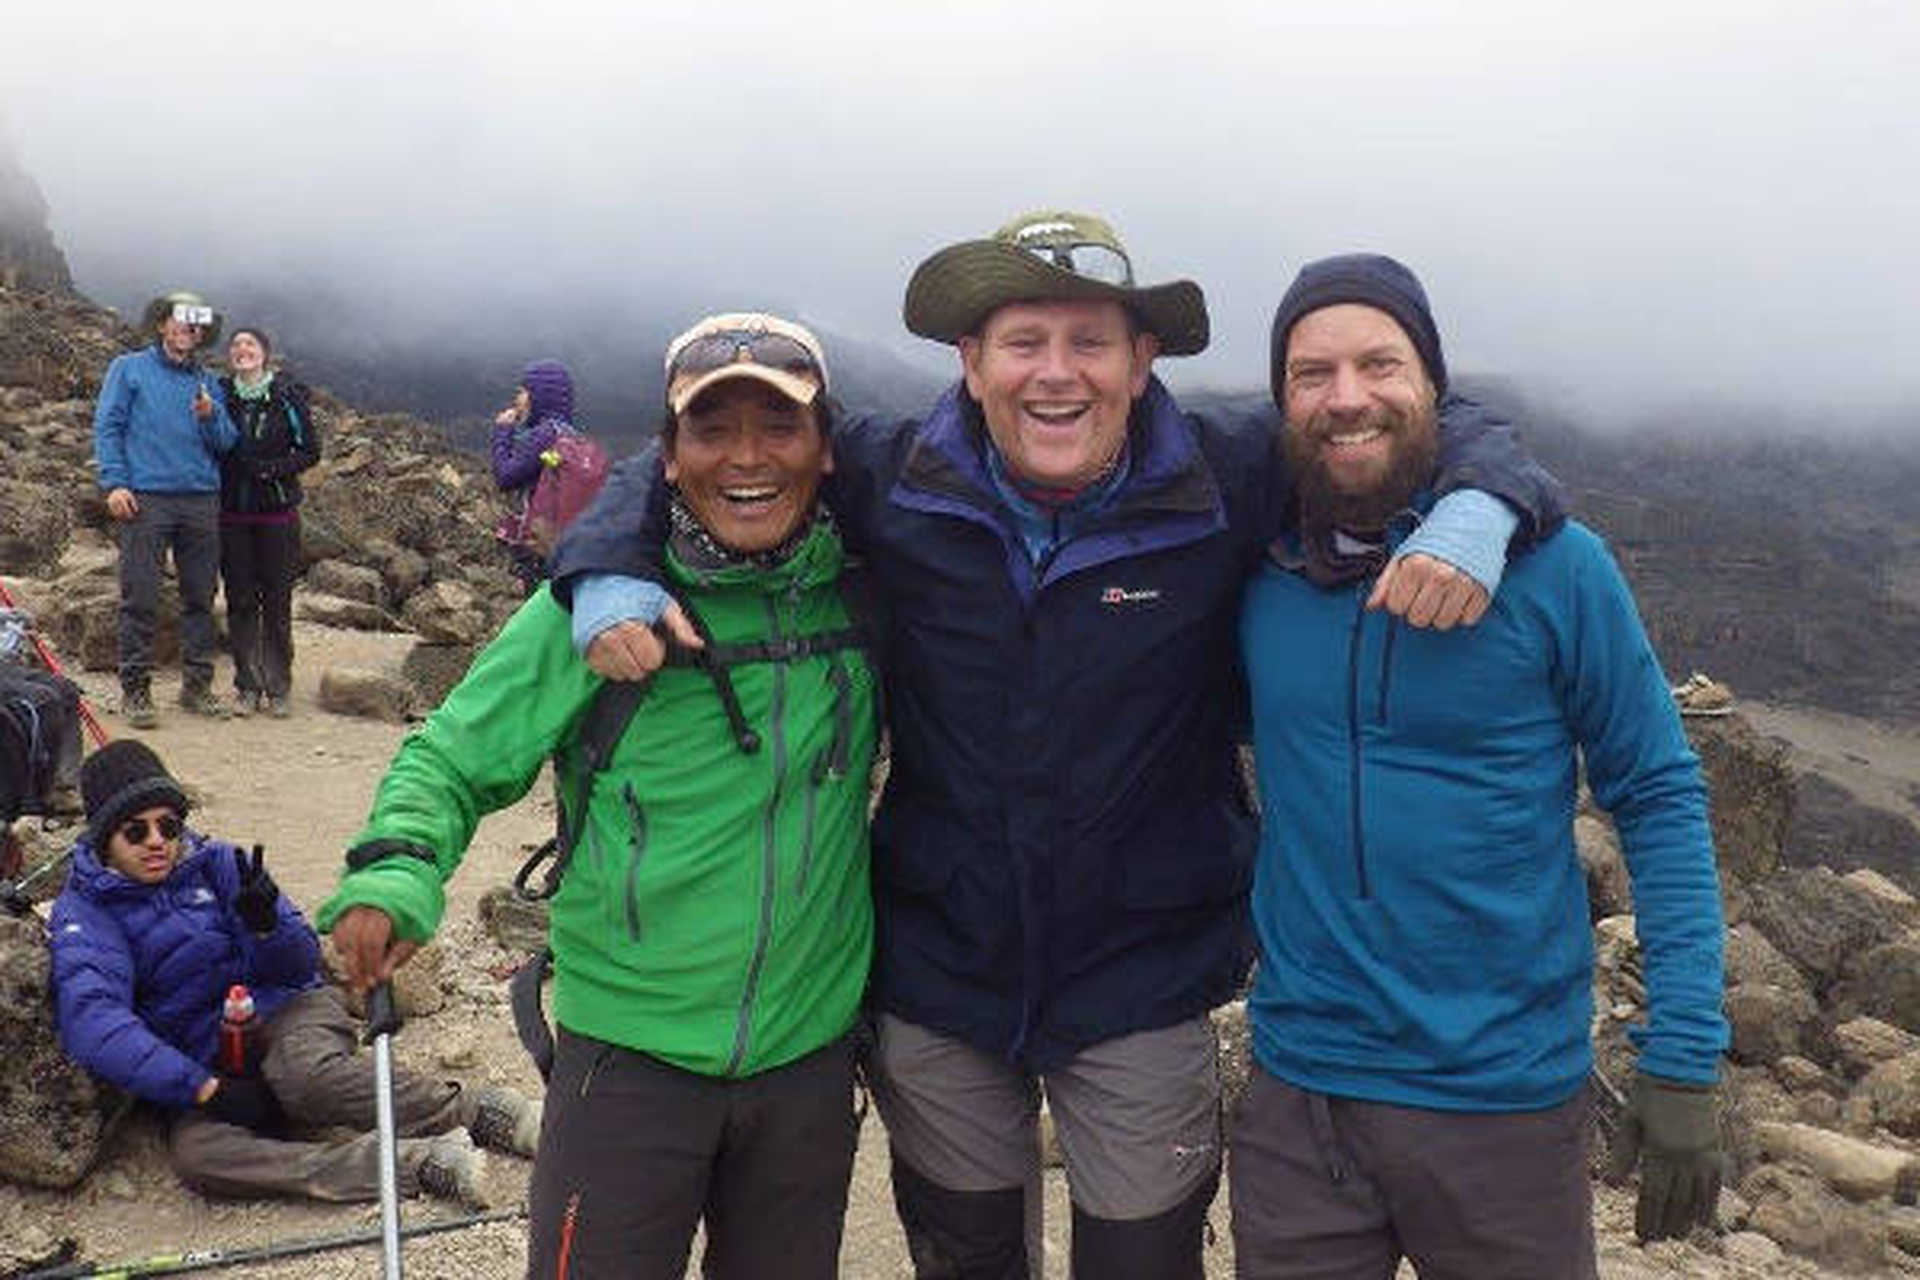 Our Nepal guide, Dorchi, summits Kilimanjaro